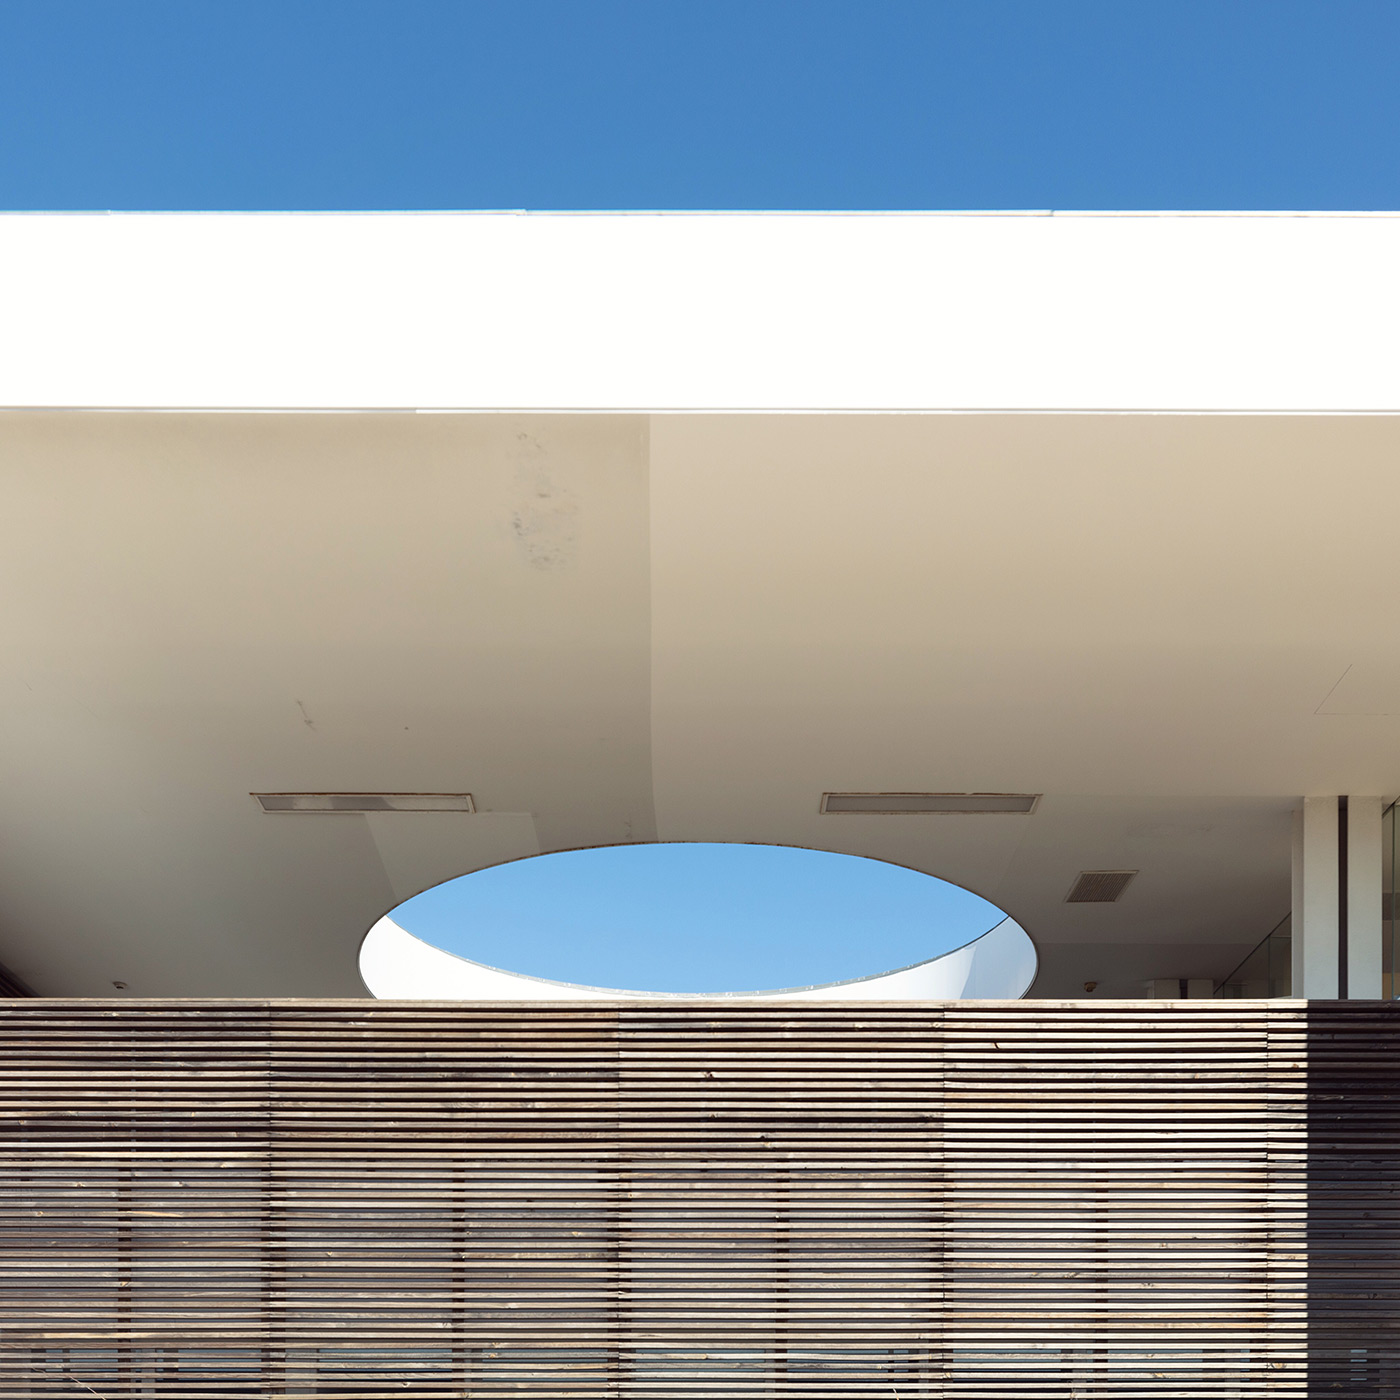 Sala de Estudo na Universidade Nova – Campolide . Location: Lisbon, Portugal . Architect: unknown to me